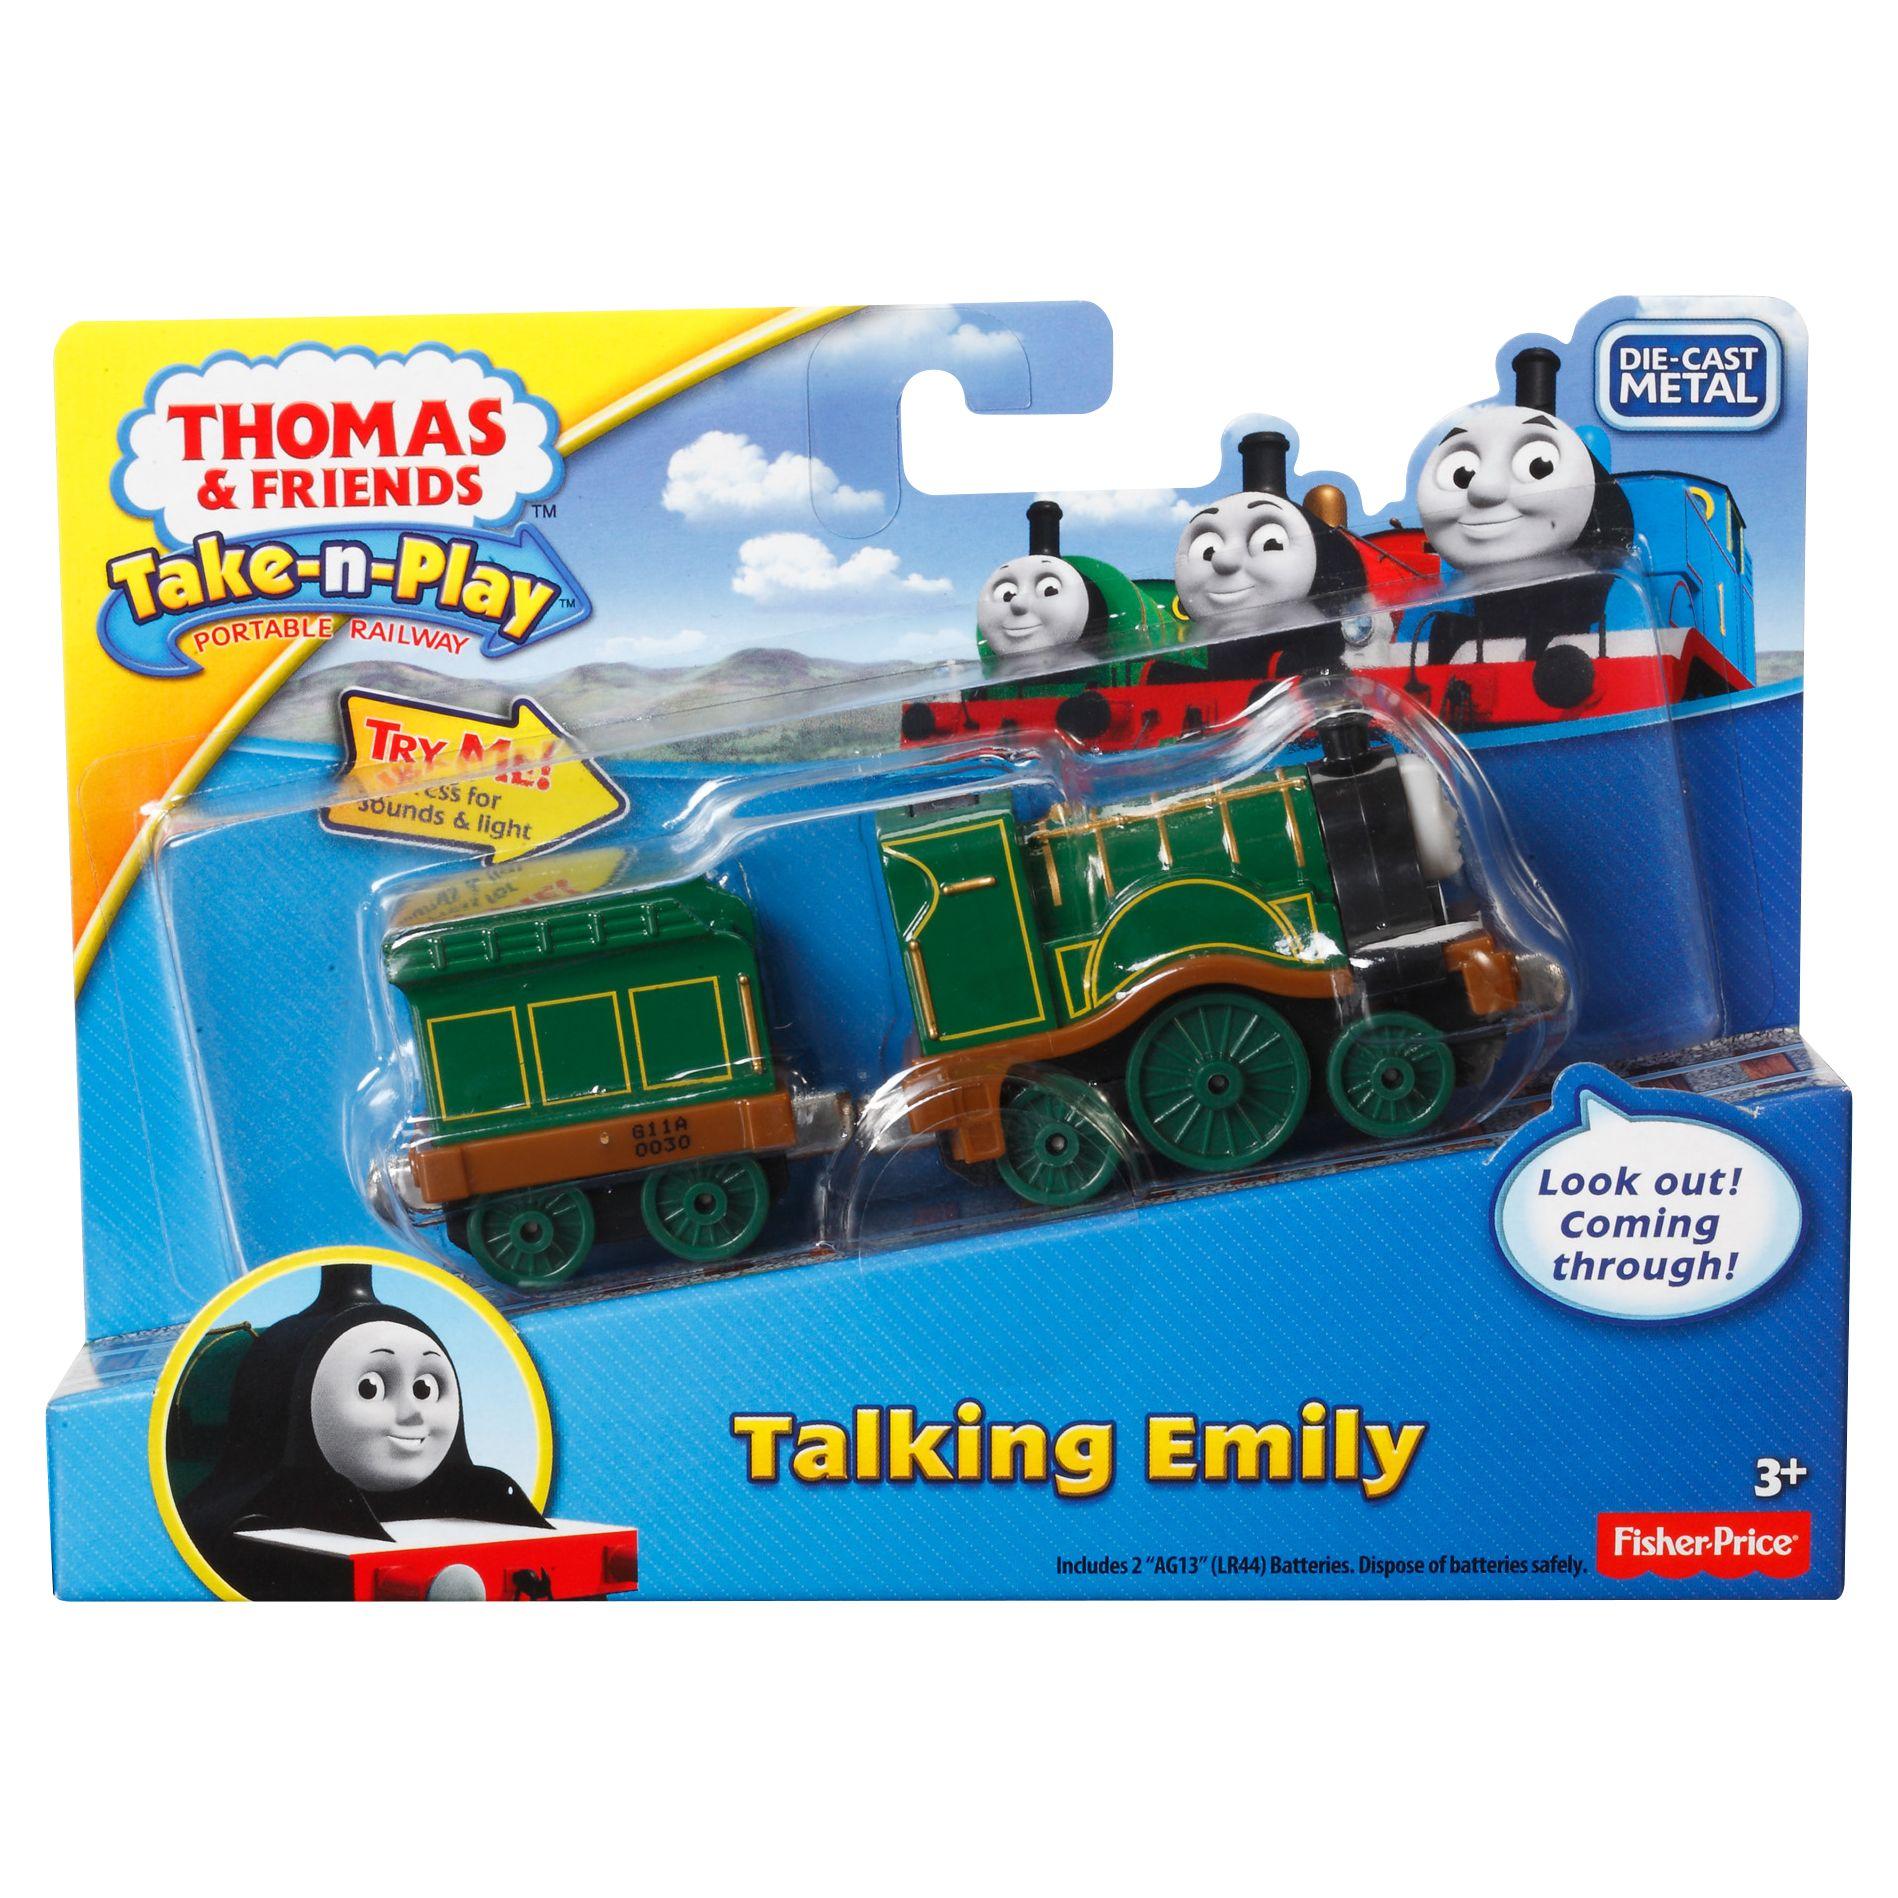 Thomas the Tank Engine Fisher-Price Thomas The Tank Engine Talking Thomas & Friends, Assorted